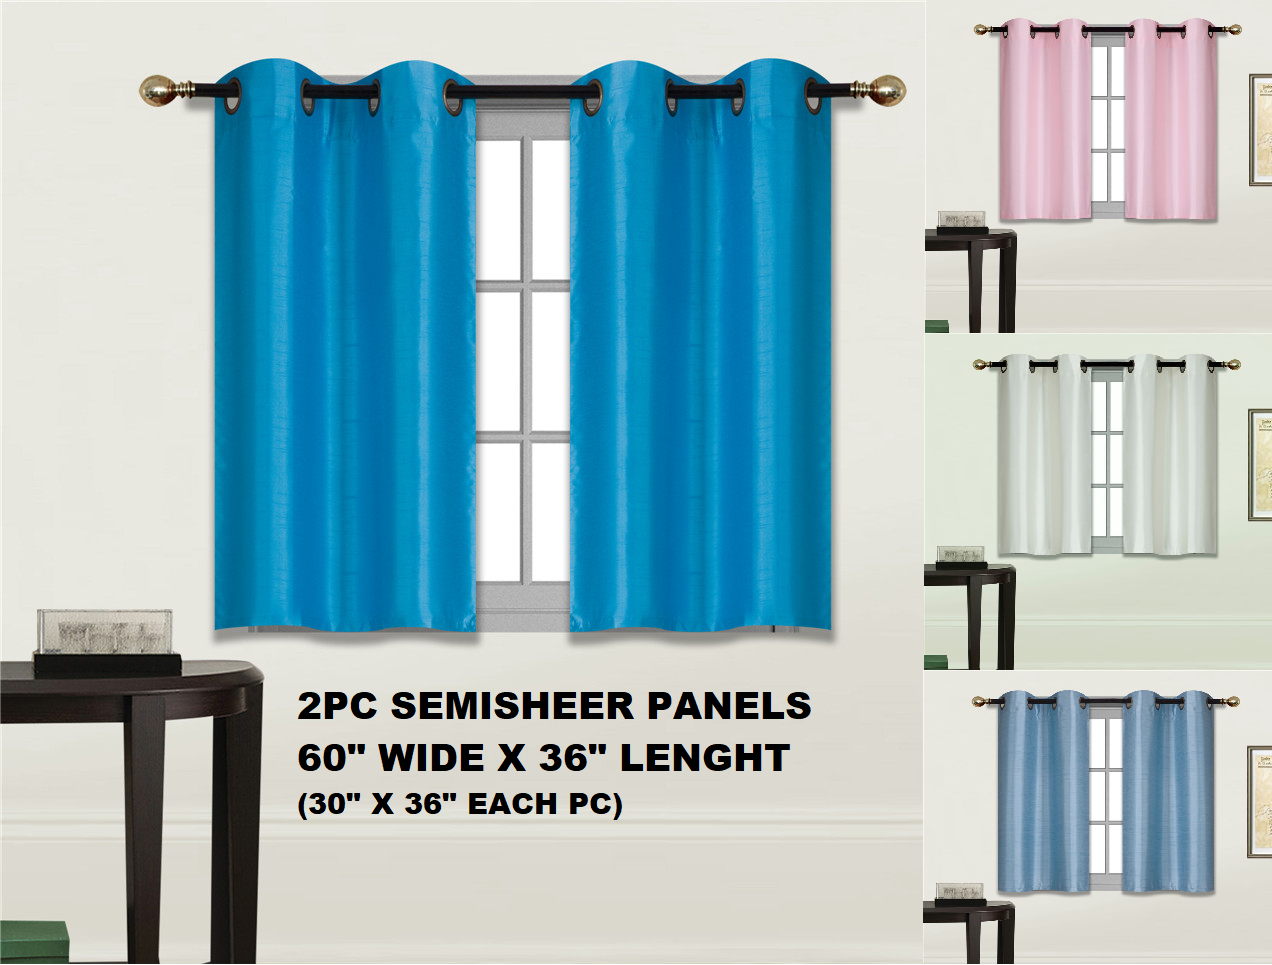 2pc LIGHT FILTERING SMALL SHORT HALF WINDOW CURTAIN GROMMET